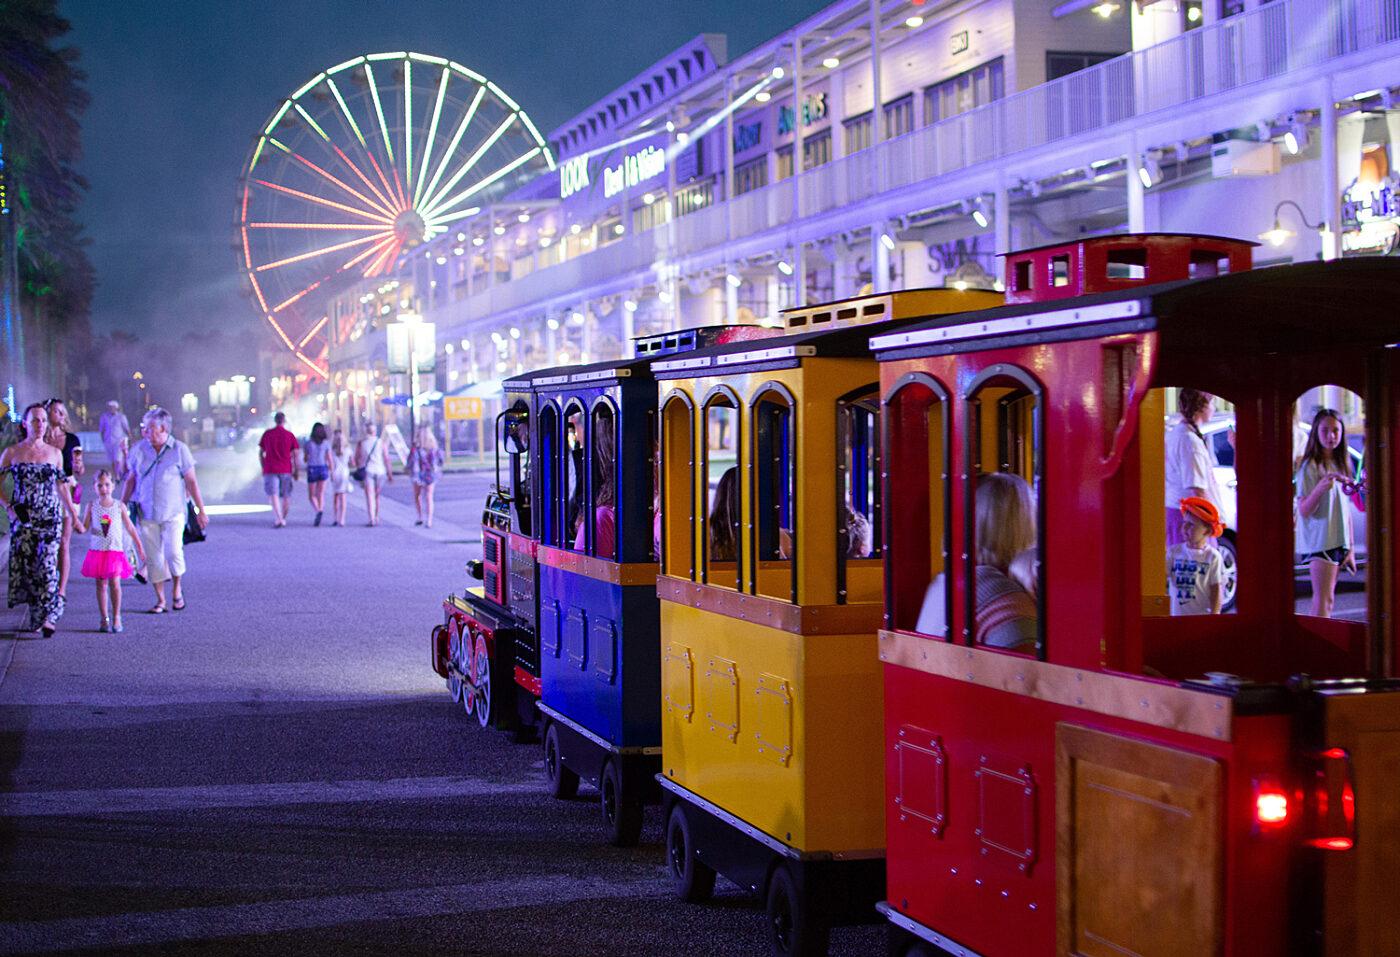 The Wharf Orange Beach SPECTRA Laser Light Experience Palm Tree Show The Wharf Express Train